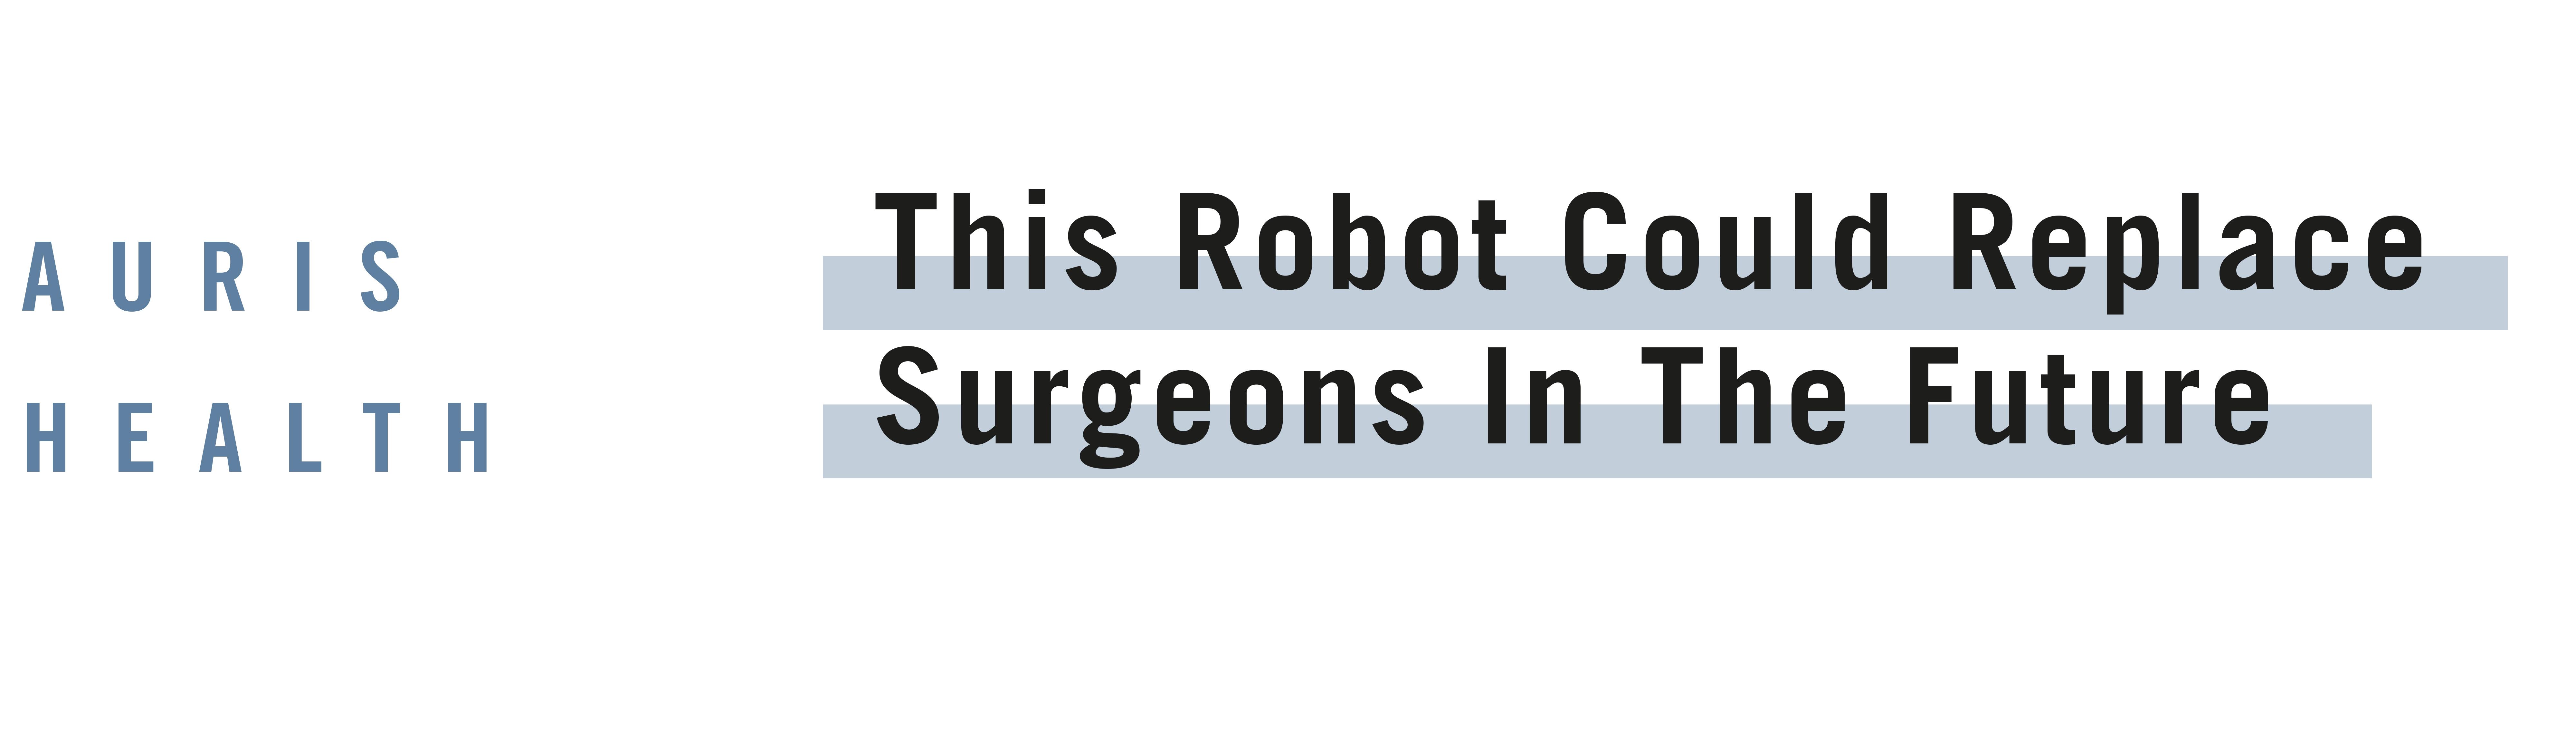 Robot Future Surgeon